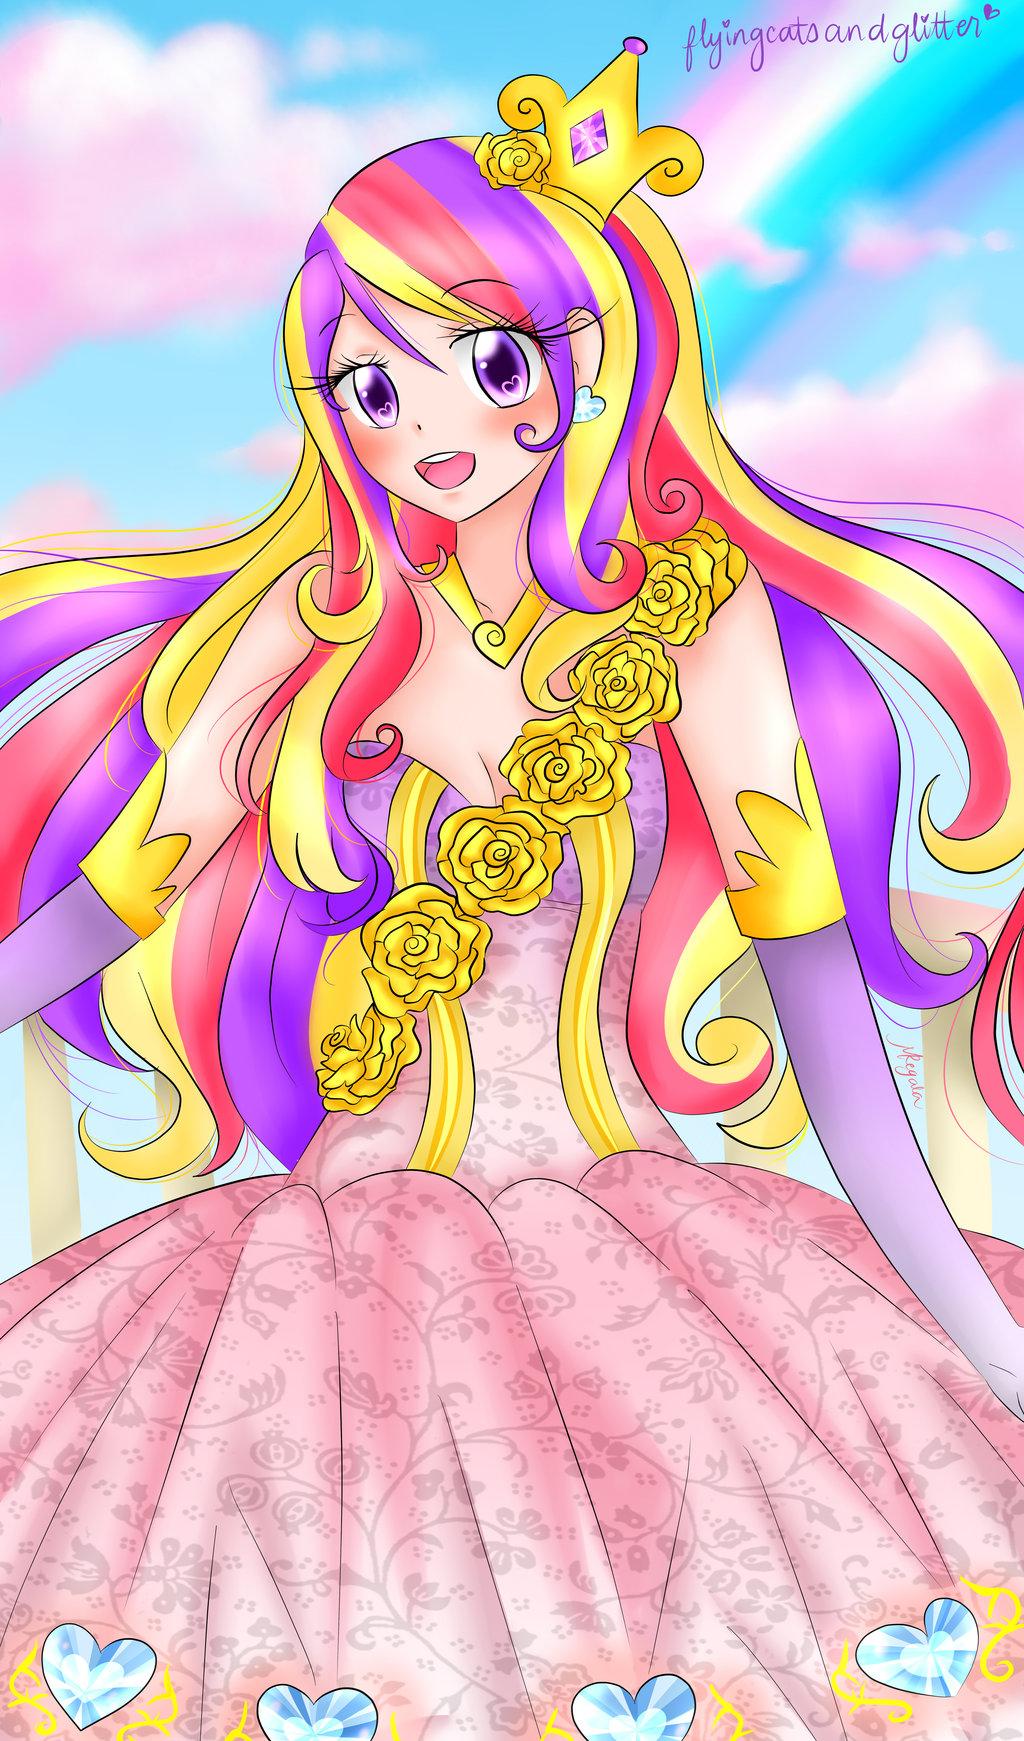 Princess Cadence - My Little Pony Friendship is Magic ...